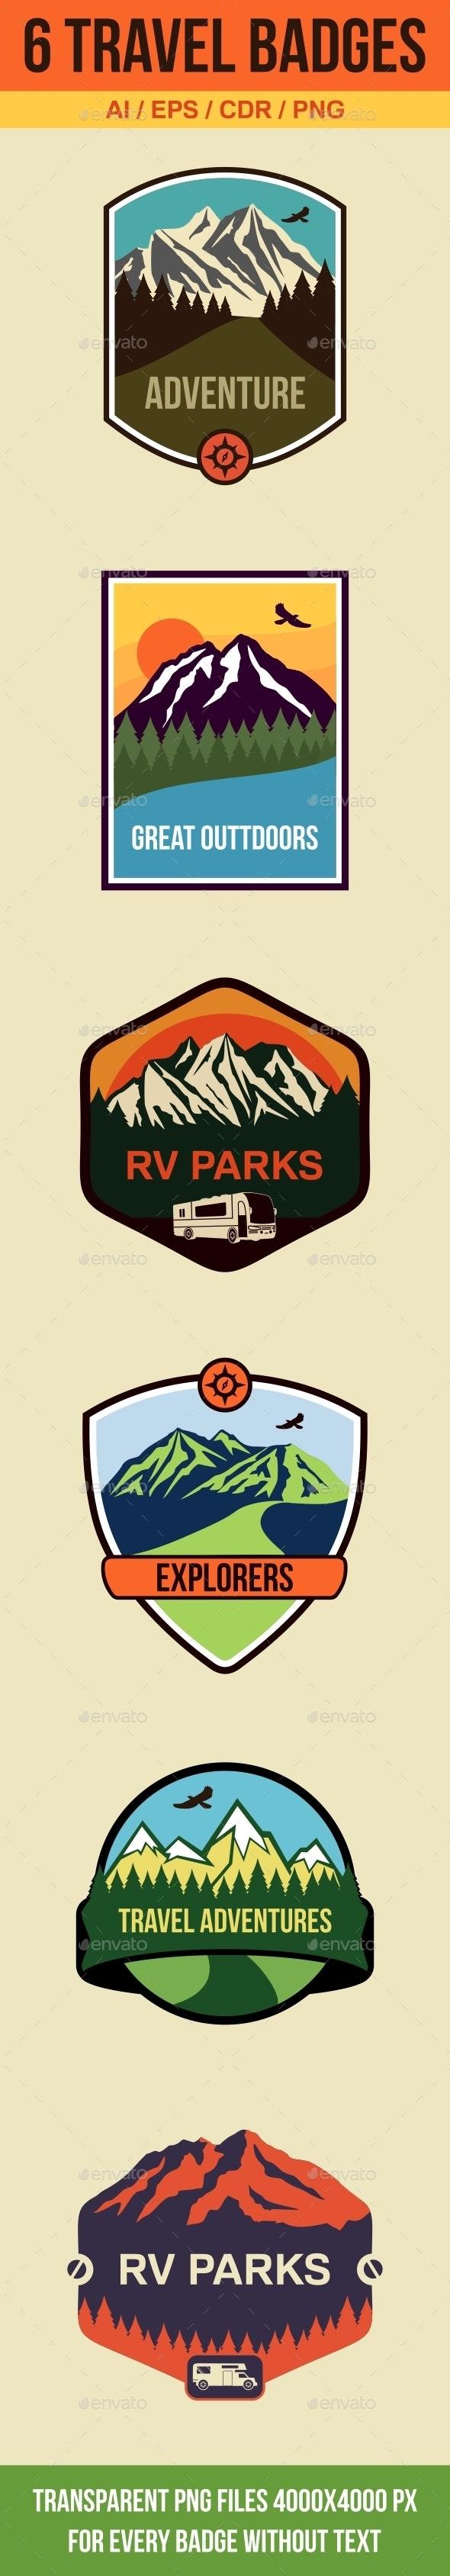 6 Travel Badges and Emblems - Travel Conceptual